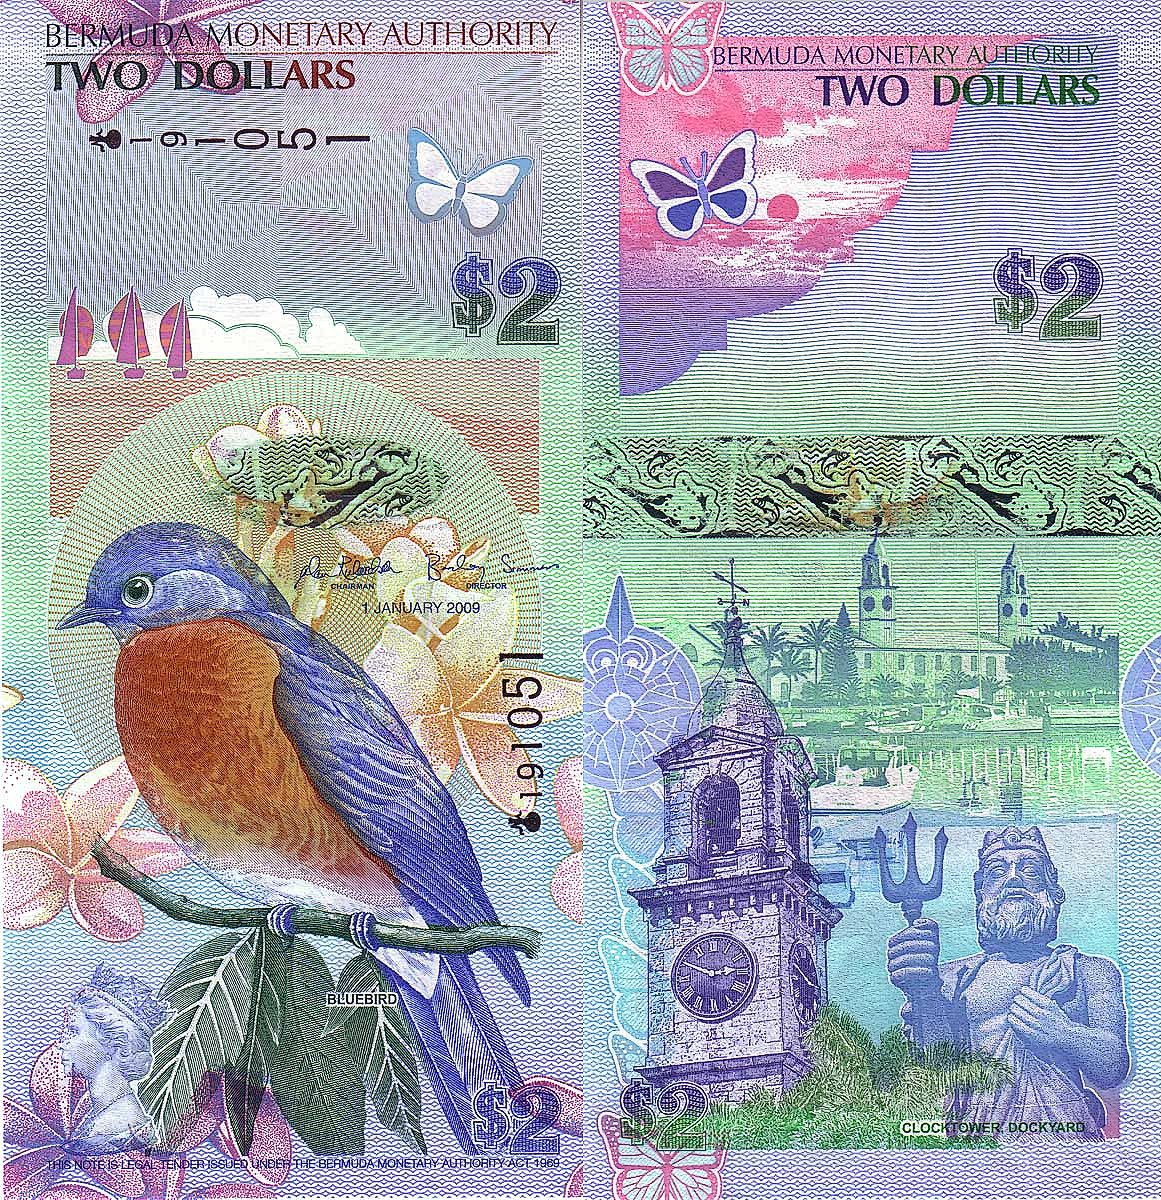 Bermuda 2 Dolares 2009 Bank Notes Currency Design Money Notes